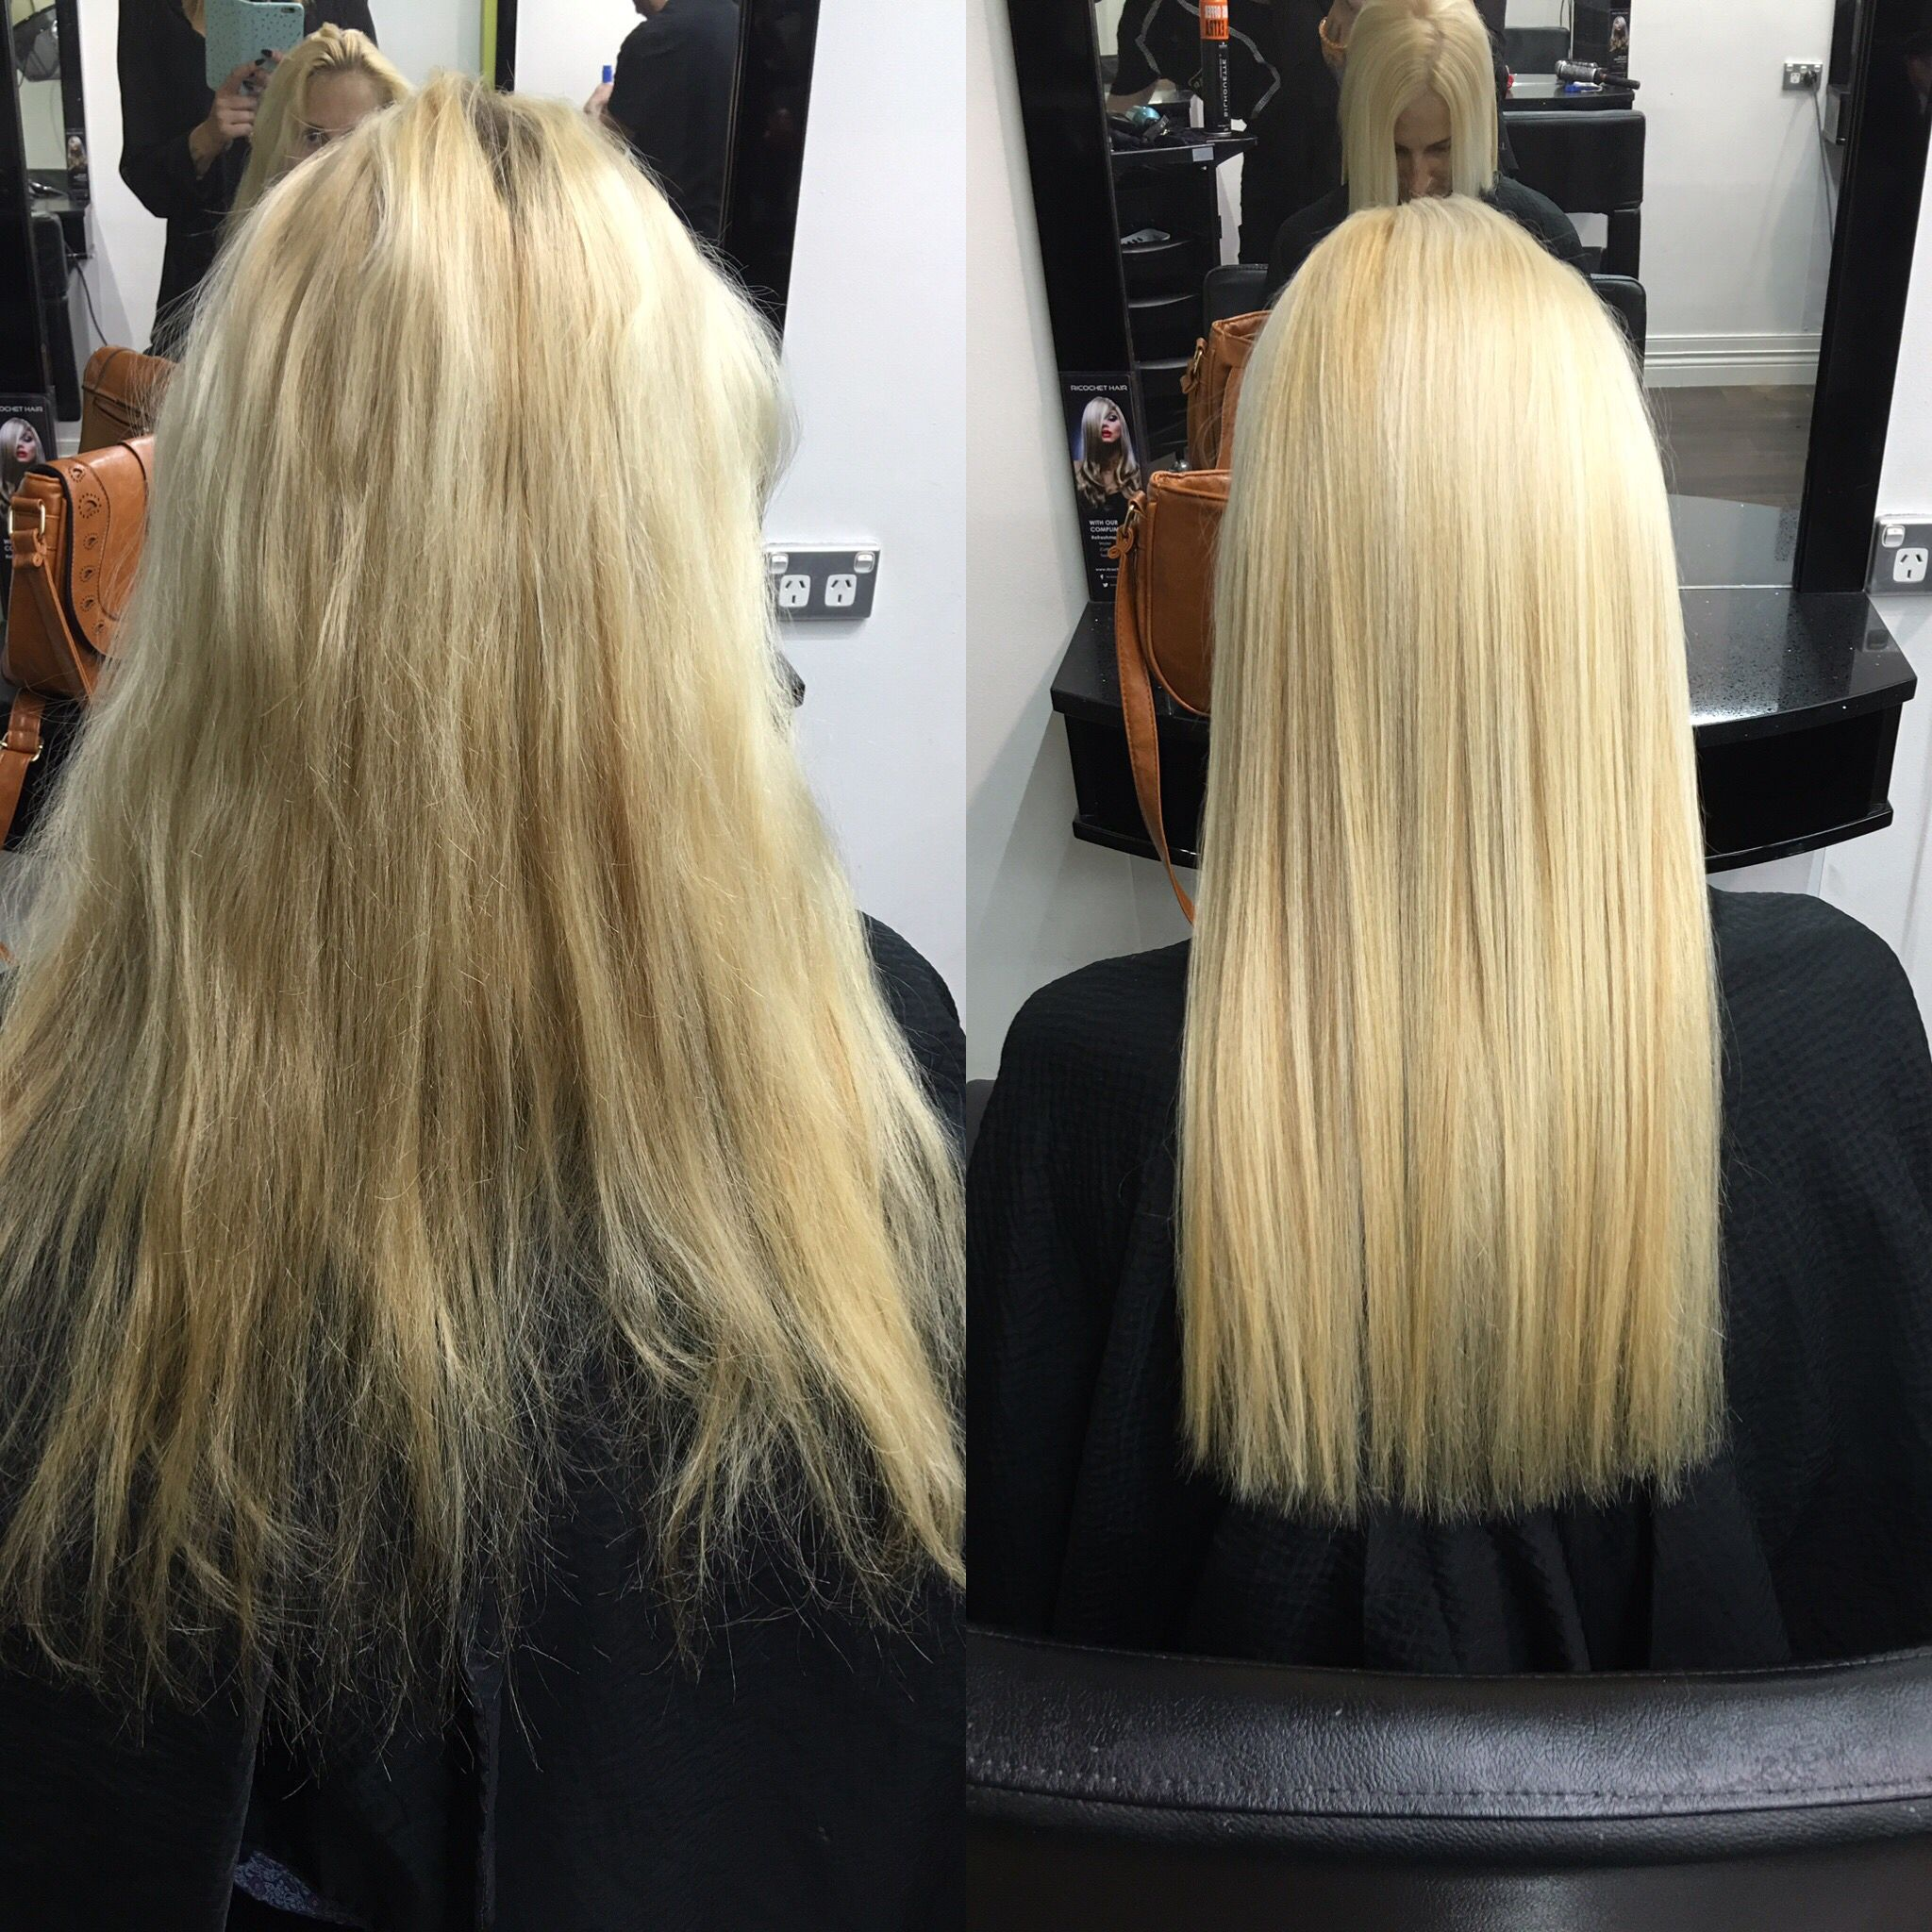 How to make hair lush